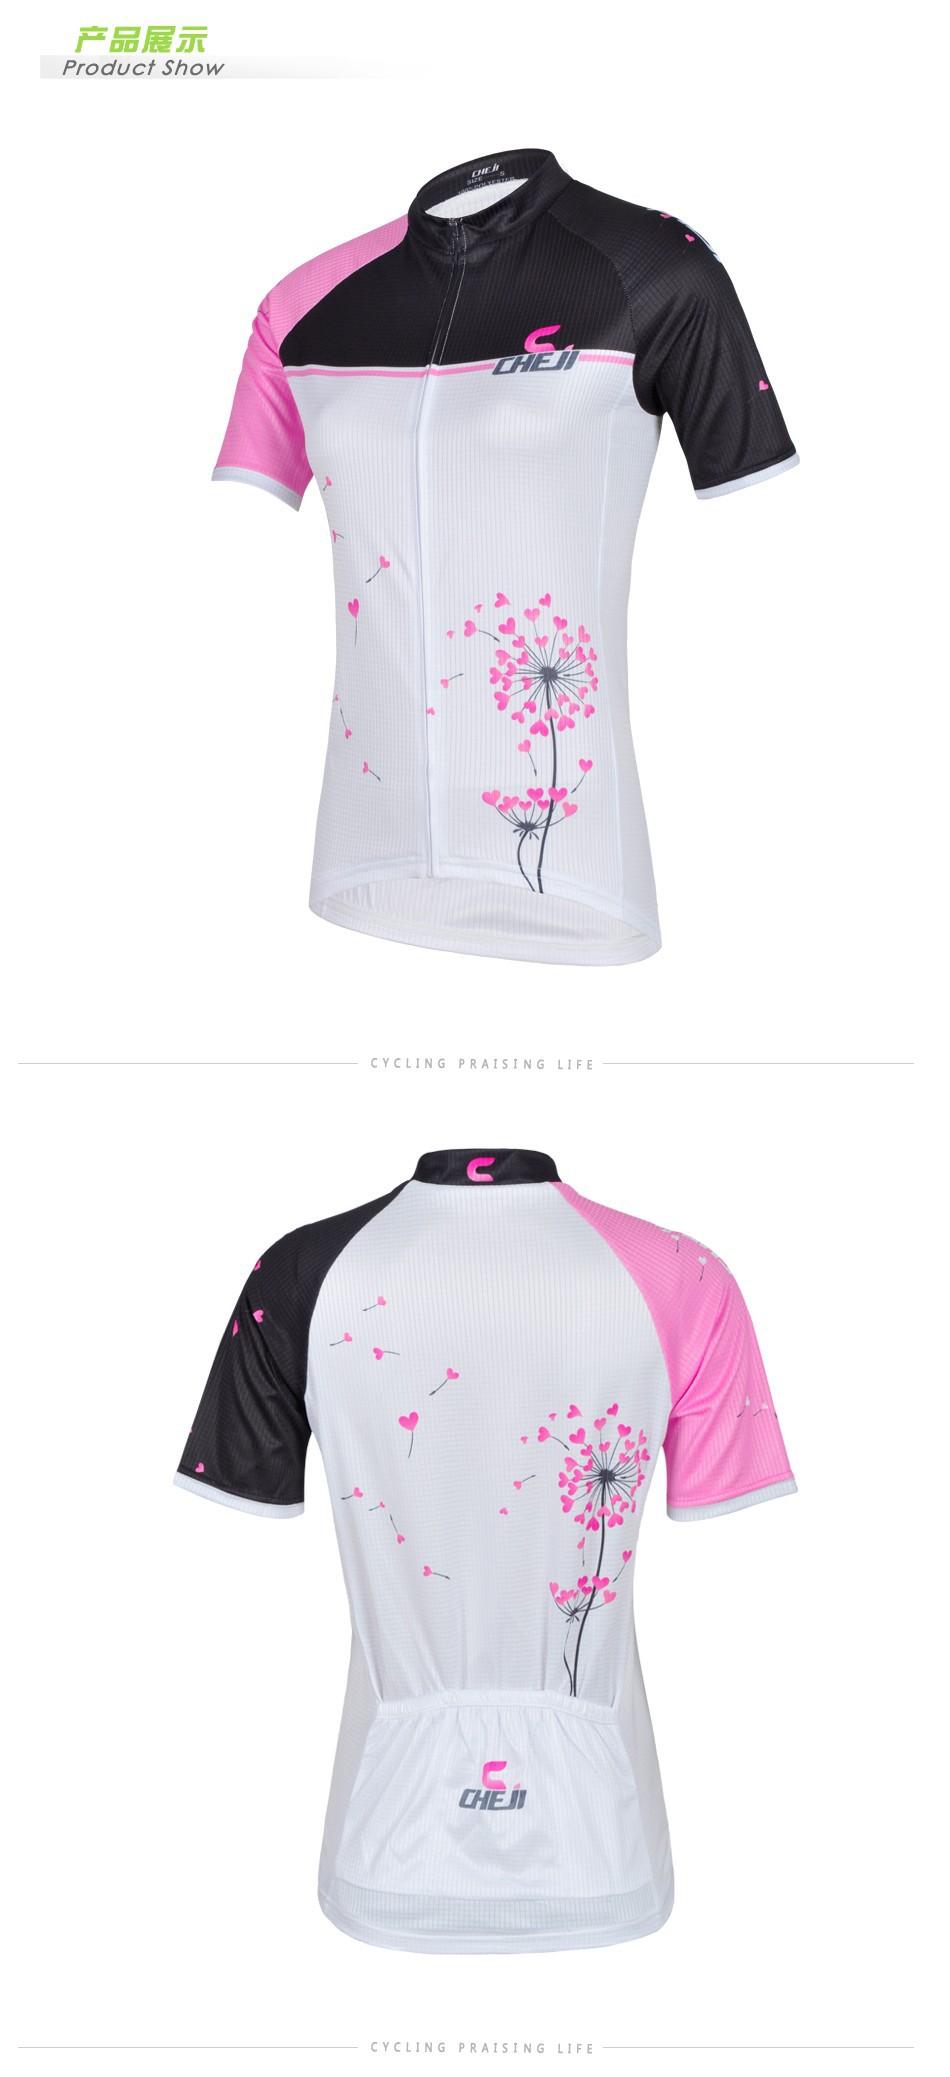 Женский костюм для велоспорта , /, Paded, s/xl cheji women cycling jersey